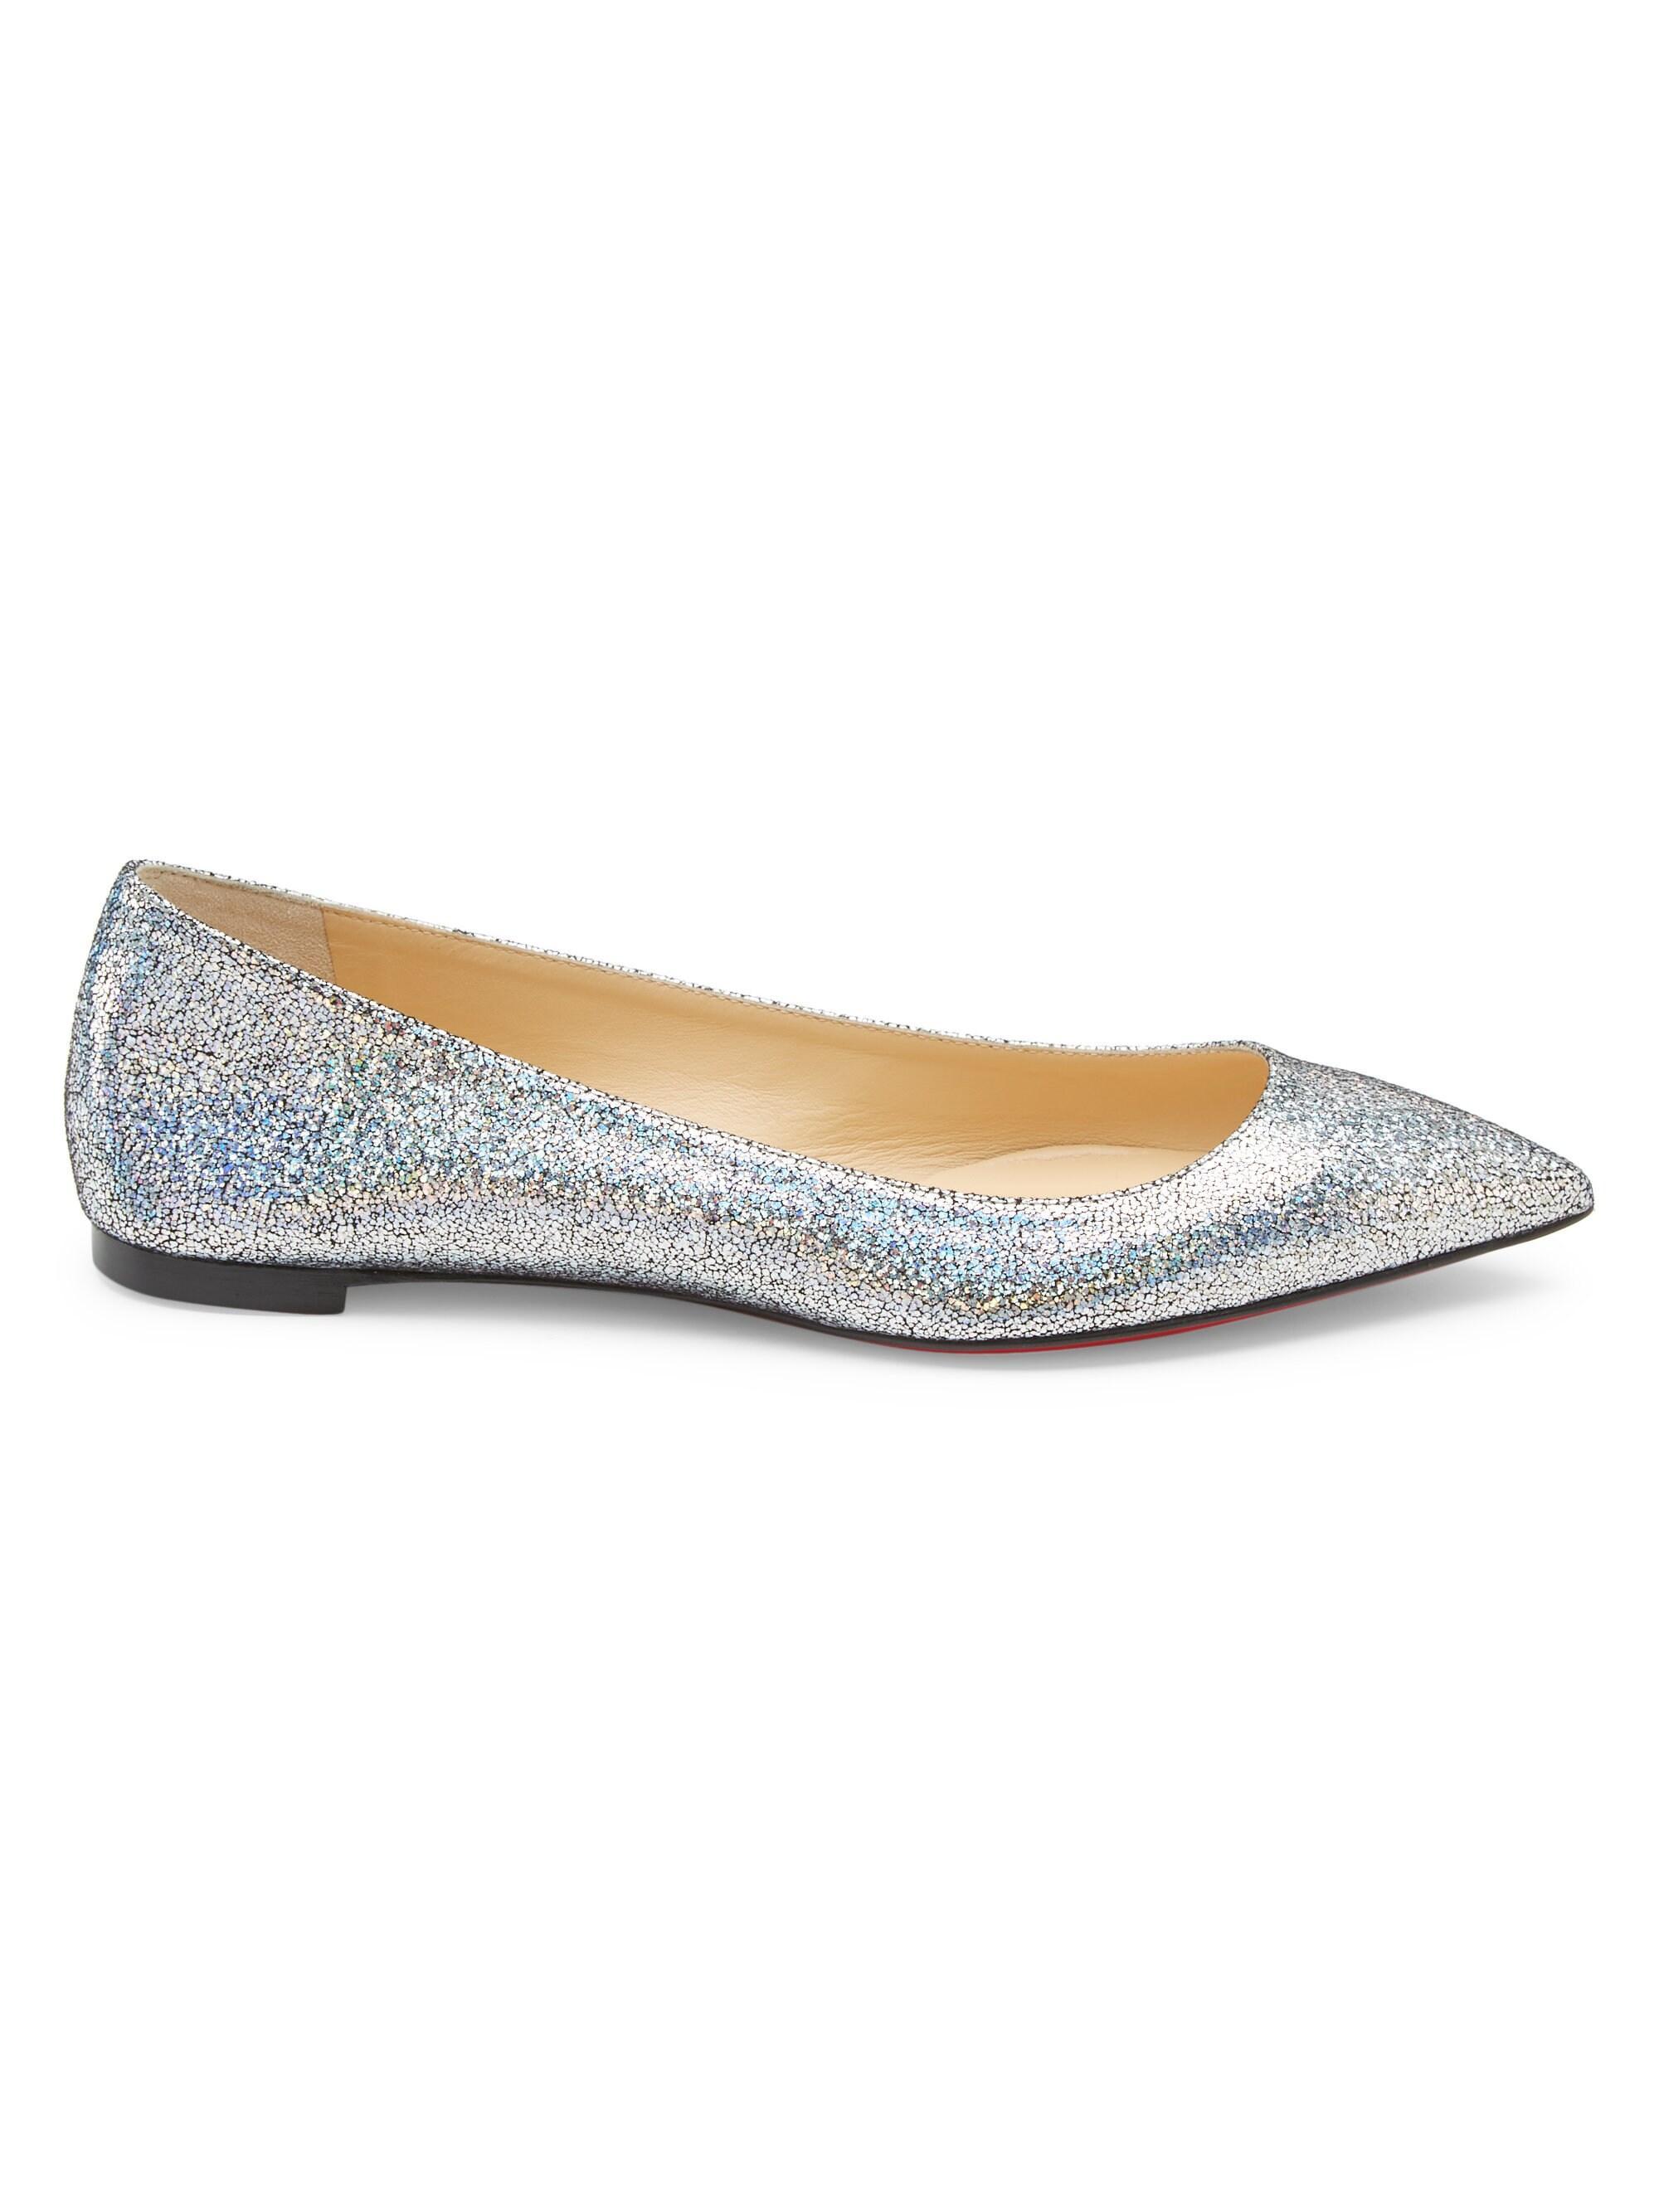 0126d573edf0 Christian Louboutin Ballalla Glitter Skimmer Flat in Metallic - Lyst